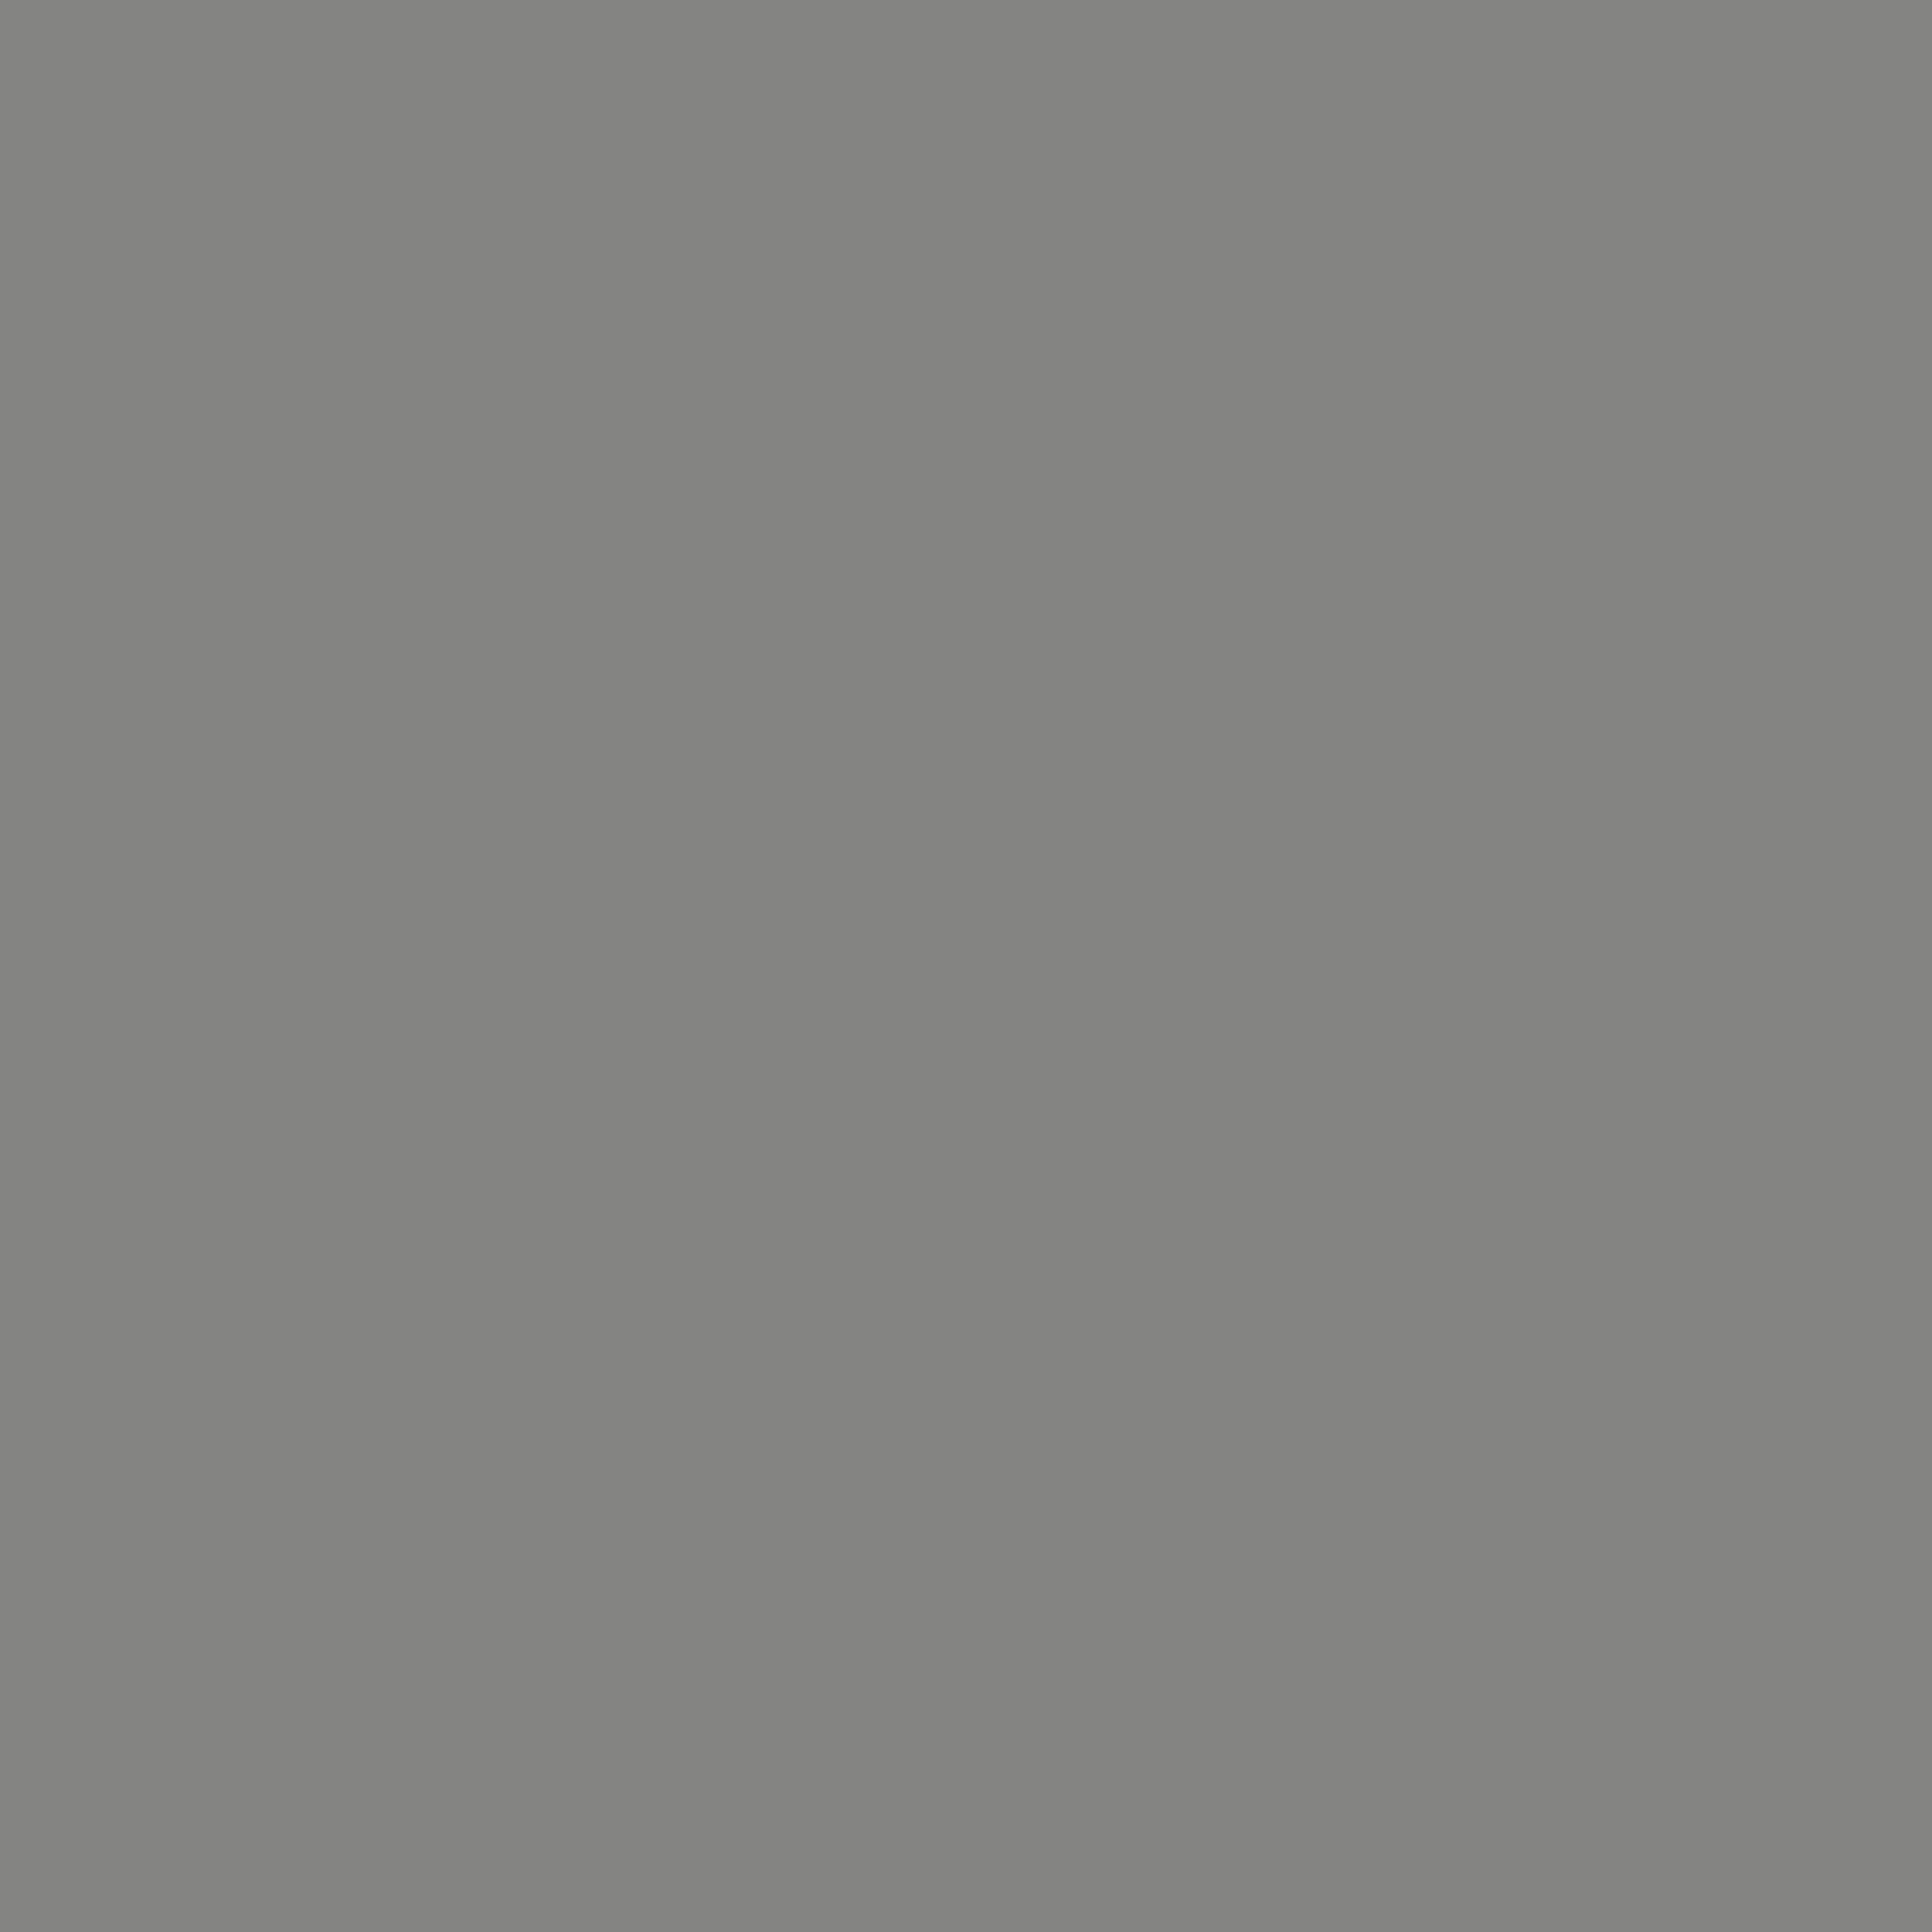 3600x3600 Battleship Grey Solid Color Background